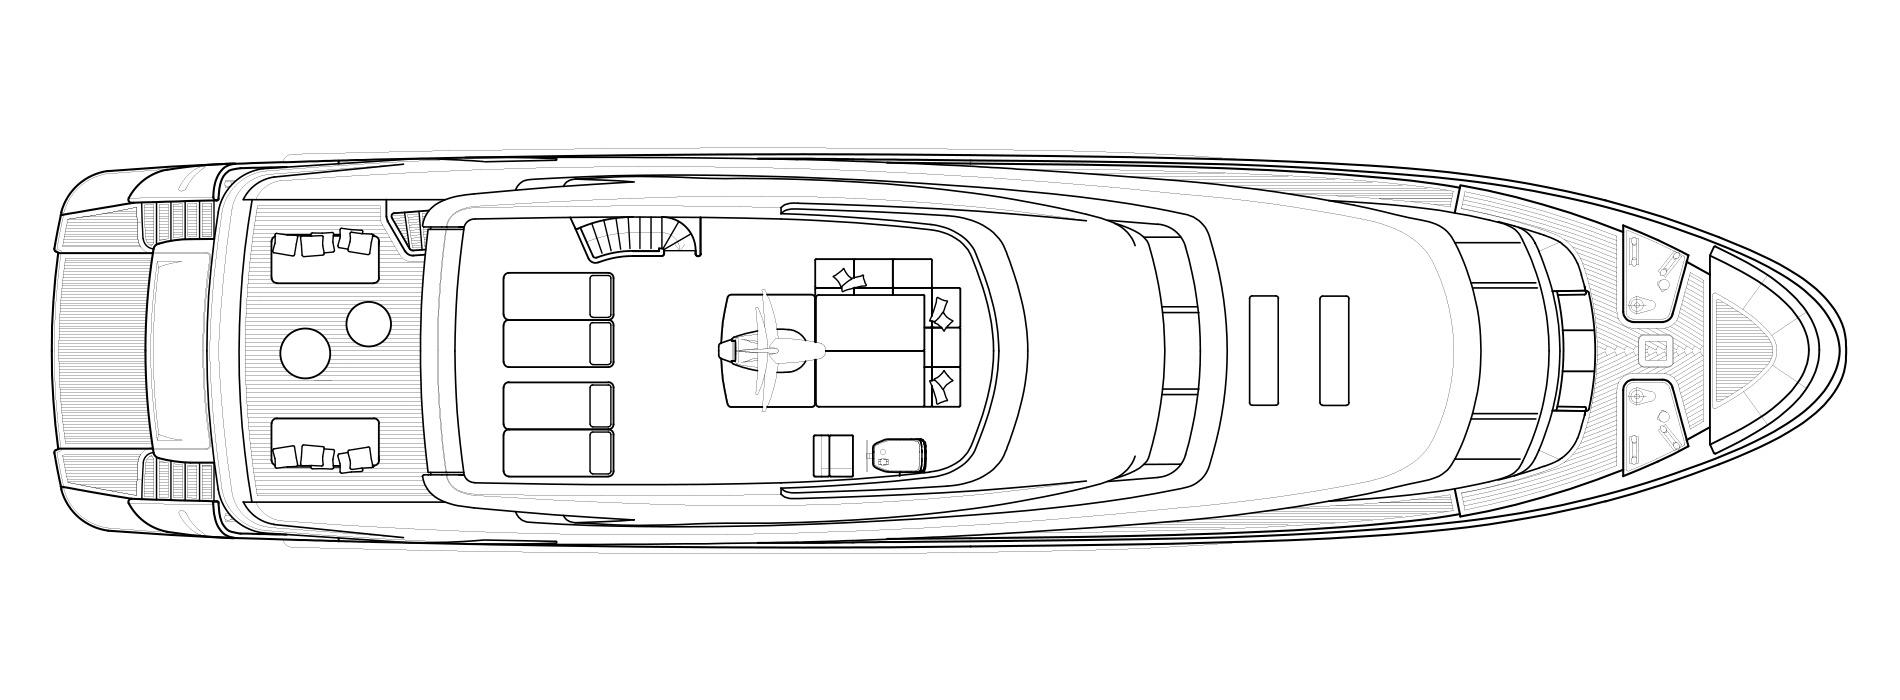 Sanlorenzo Yachts SD112 飞桥 Versione A